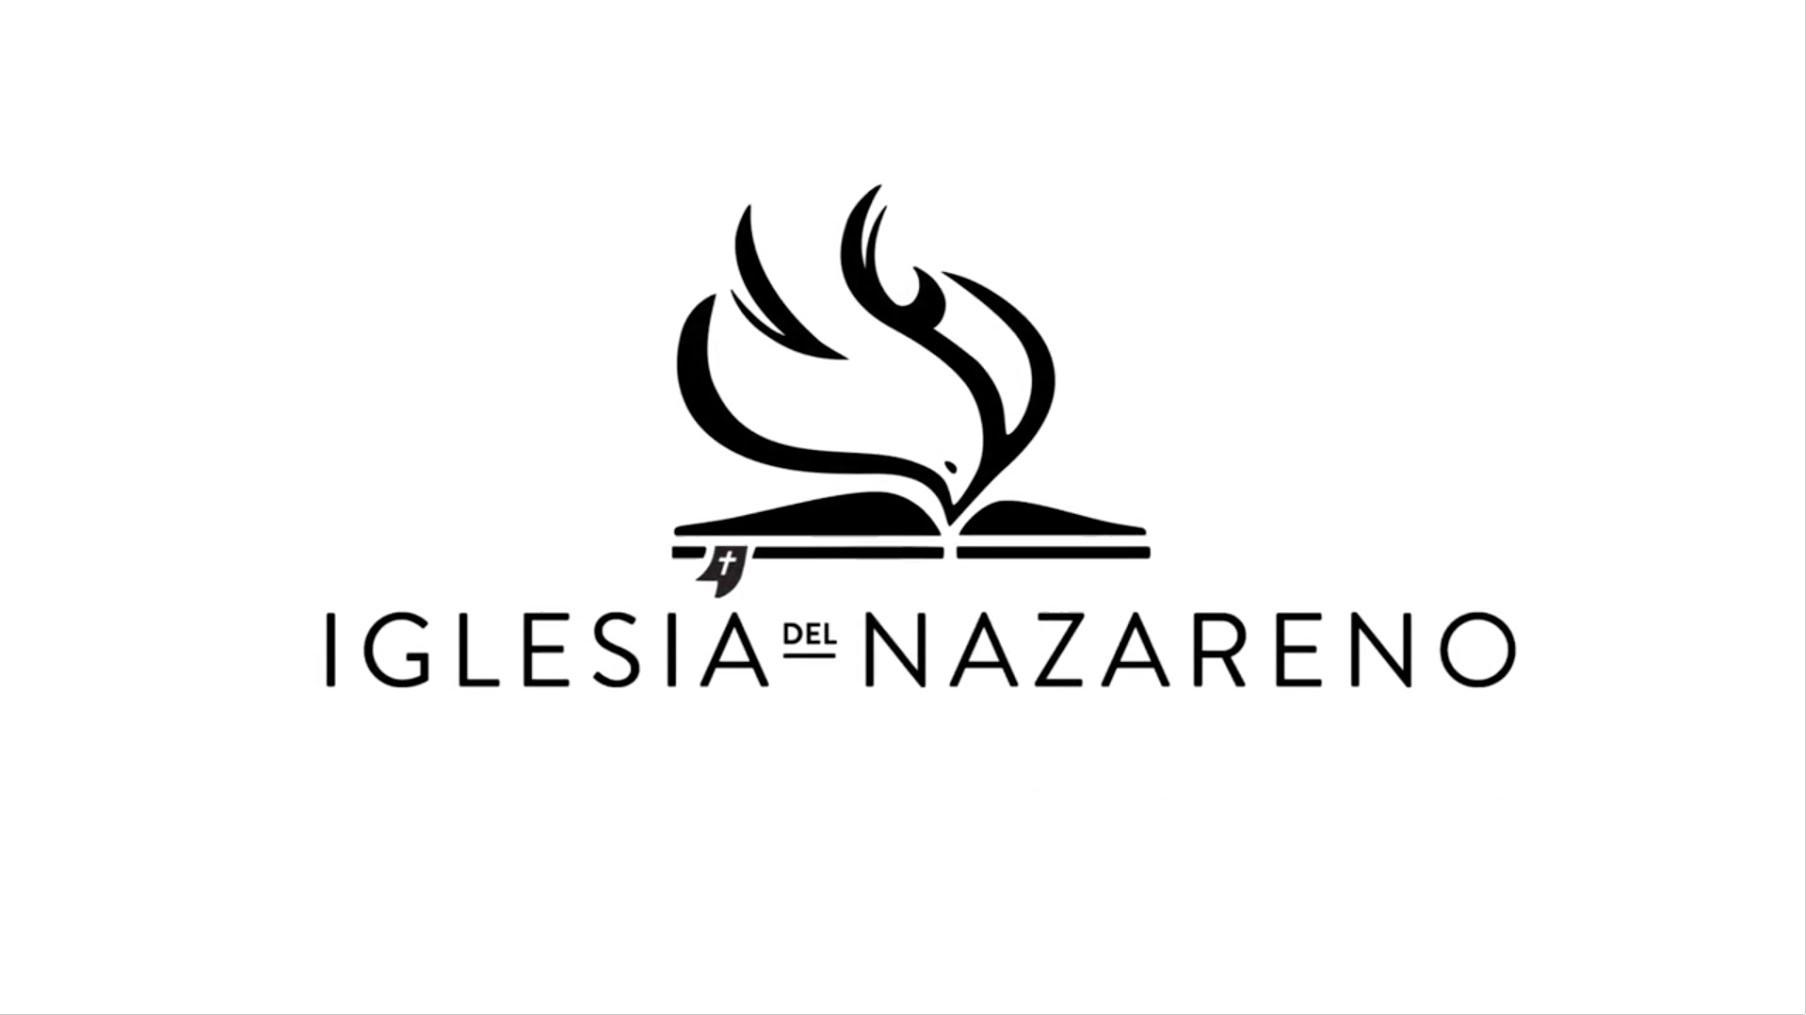 iglesia del nazareno.jpg